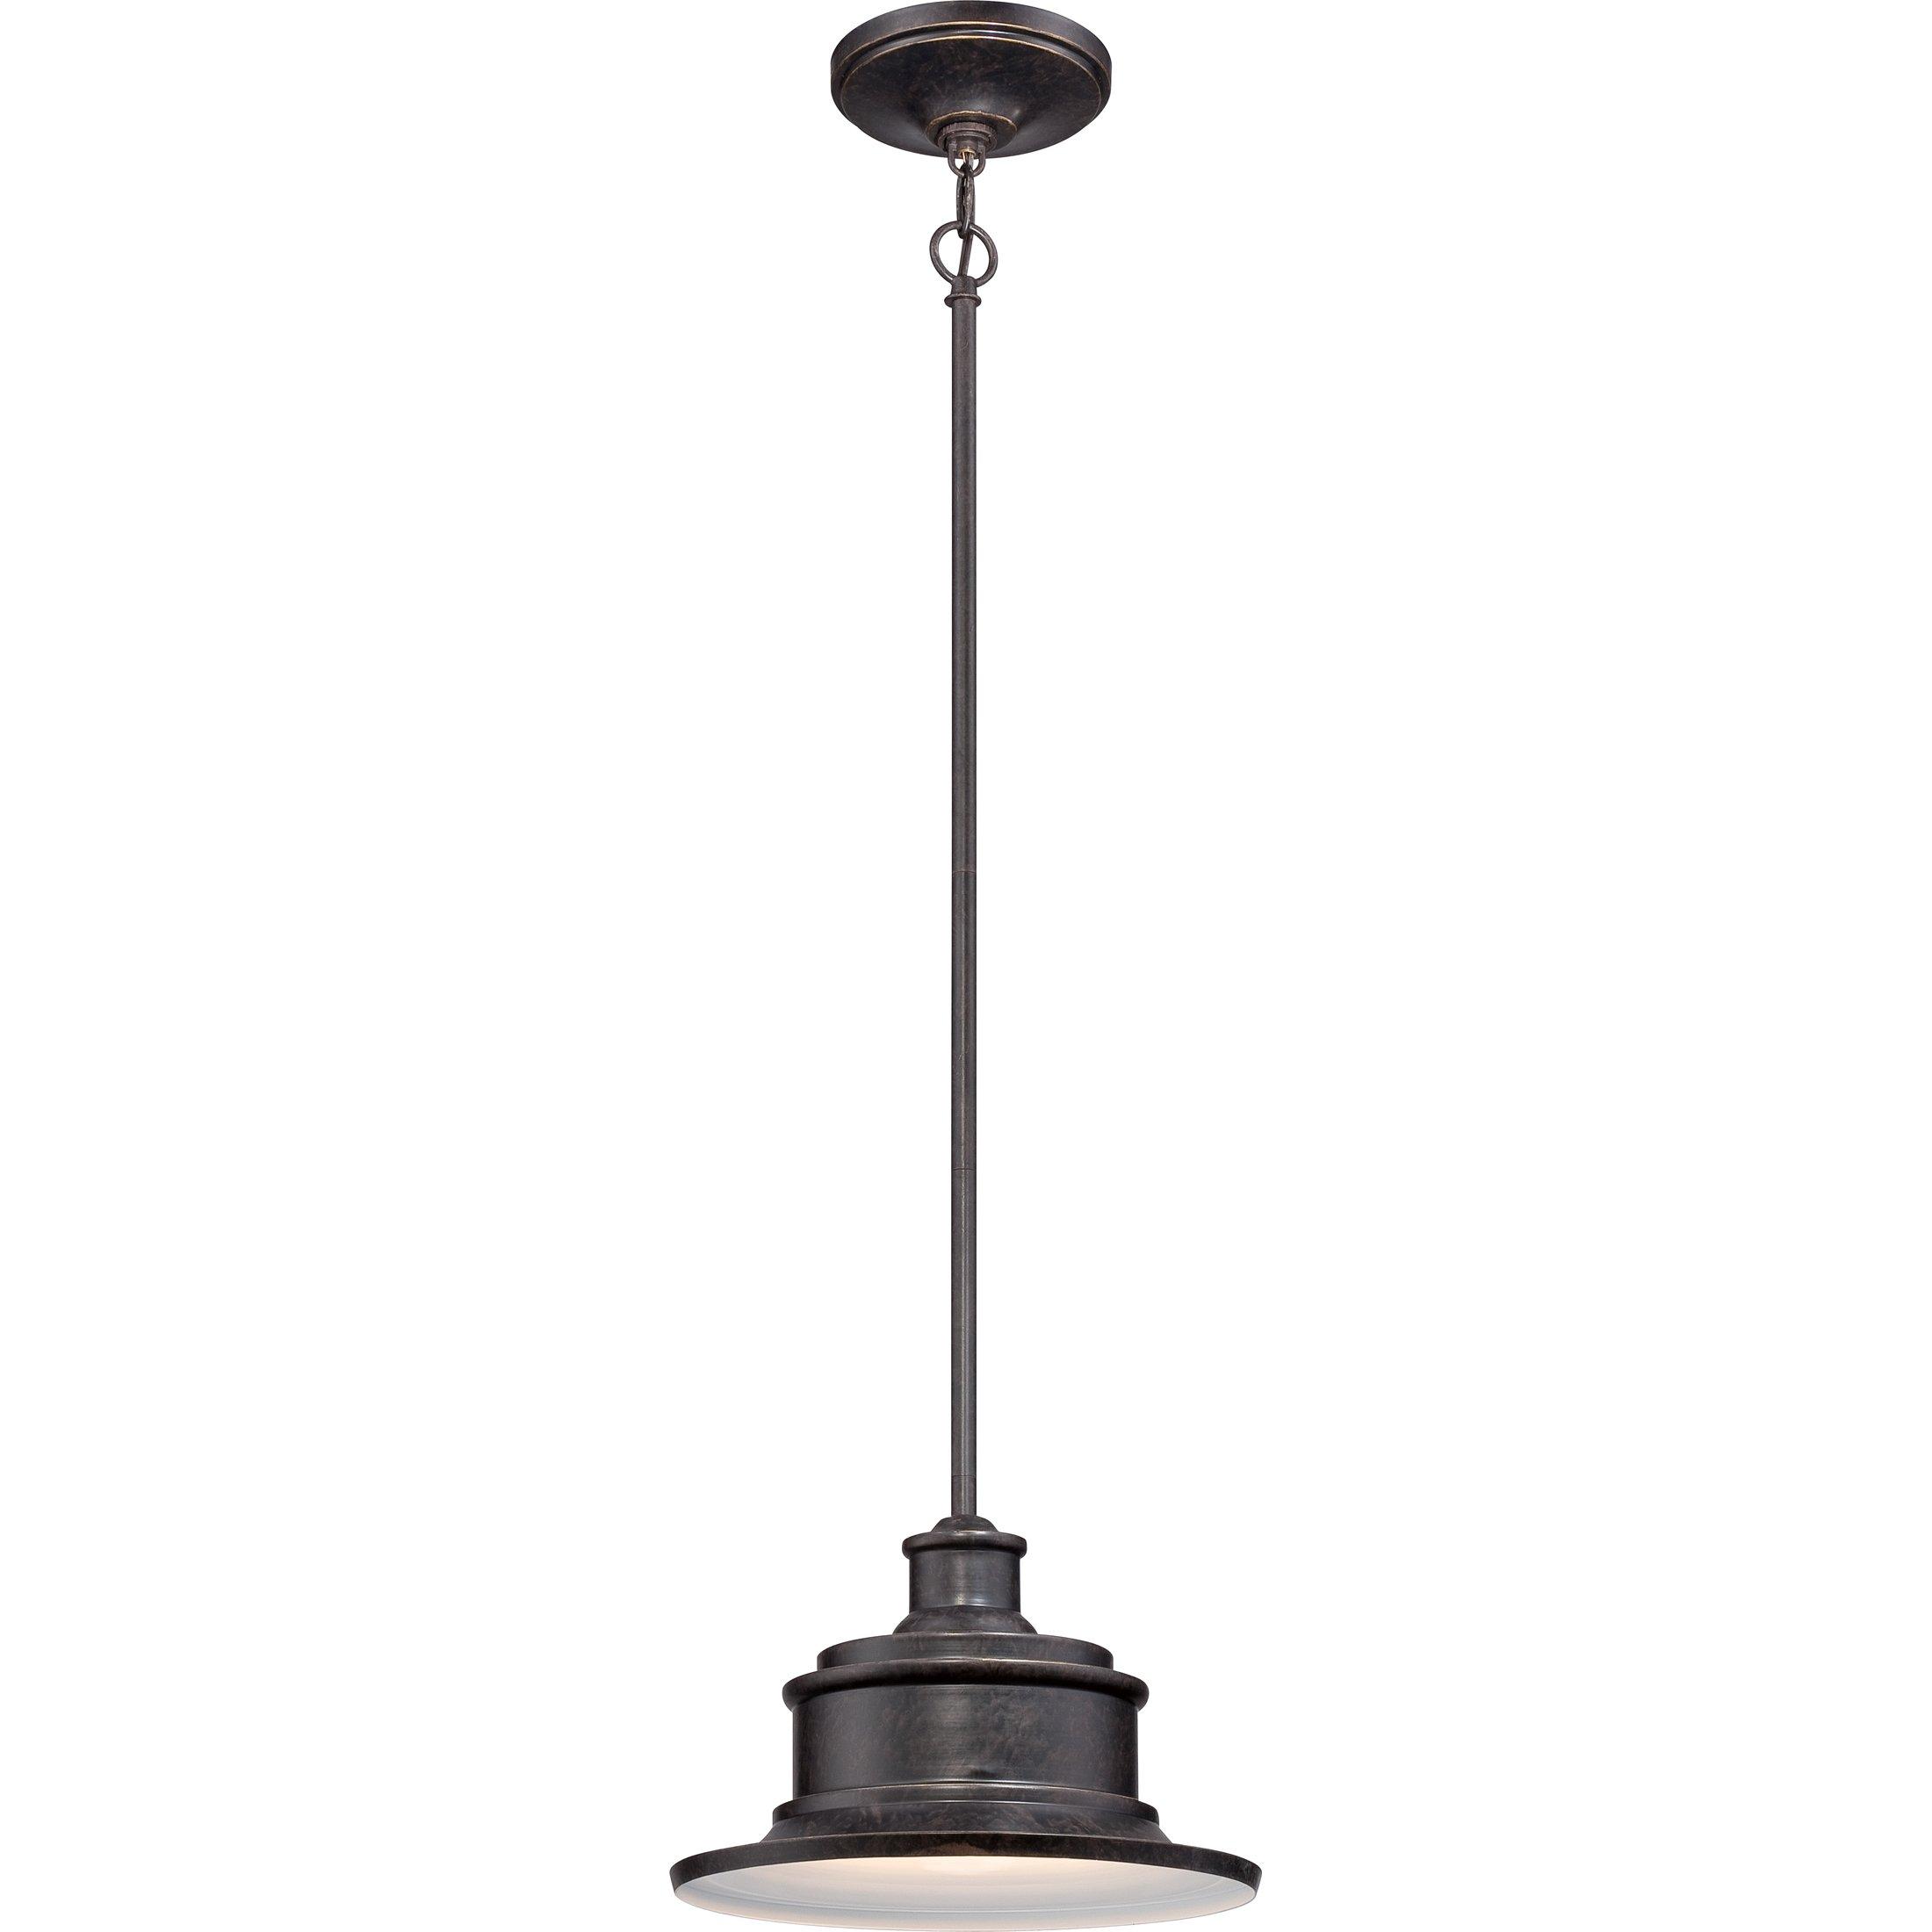 Quoizel SFD1911IB 1-Light Seaford Outdoor Lantern in Imperial Bronze